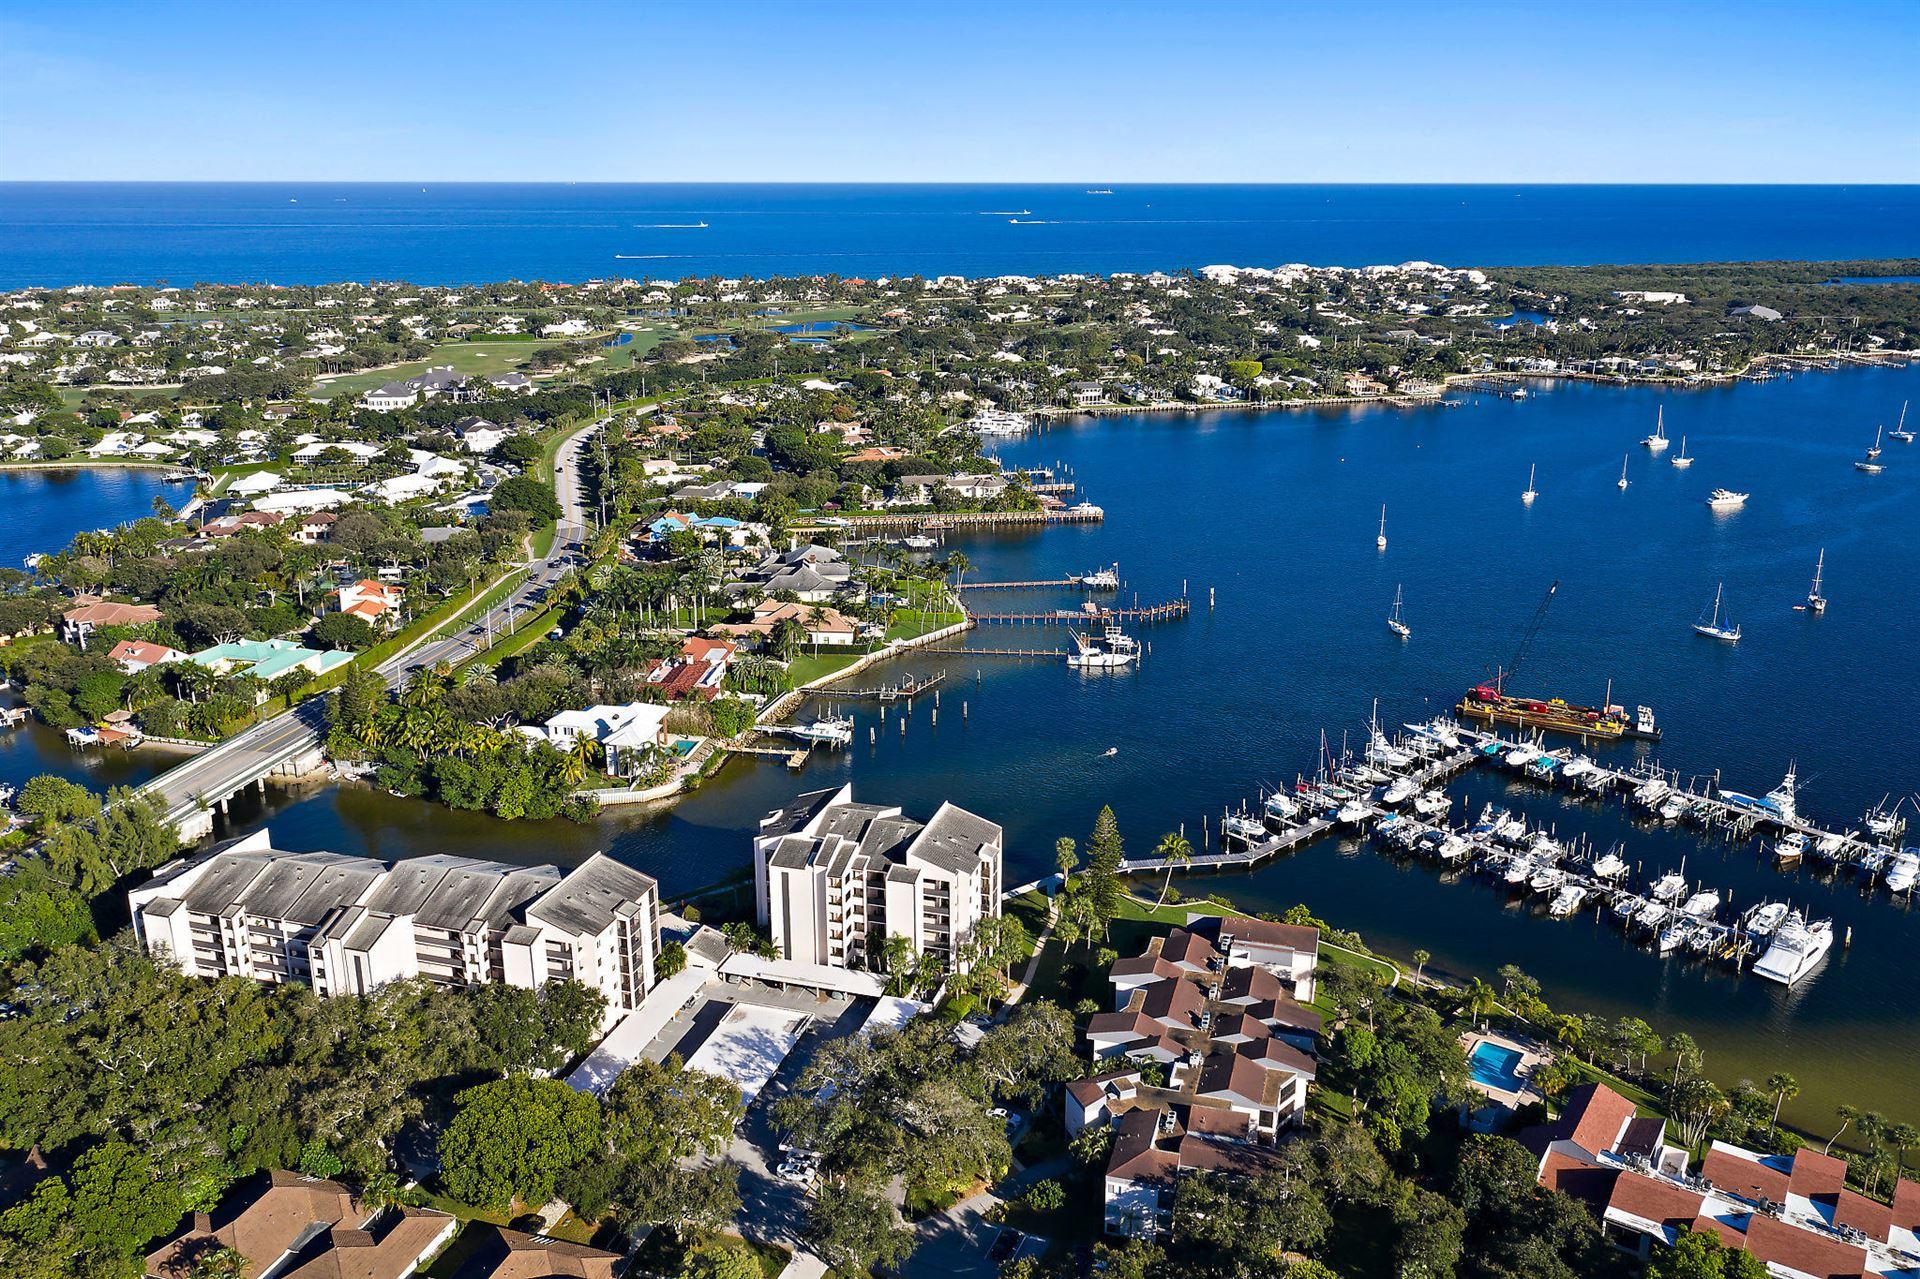 11390 Twelve Oaks Way #121, Palm Beach Gardens, FL 33408 - #: RX-10592145